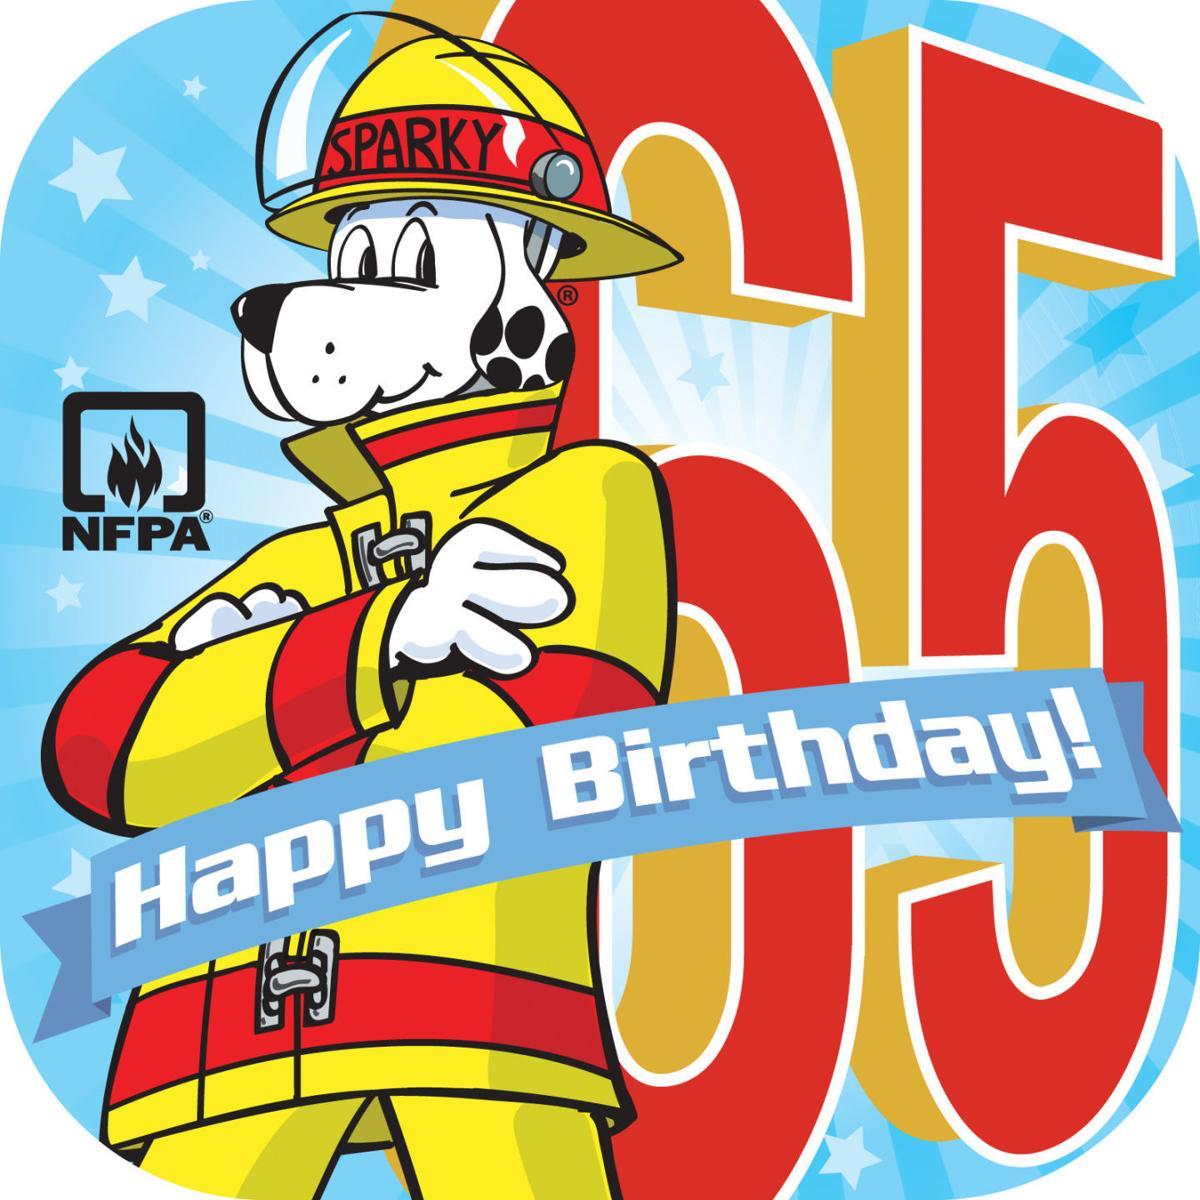 Sparky The Fire Dog Kicks Off His 65th Birthday Bucket List Celebration